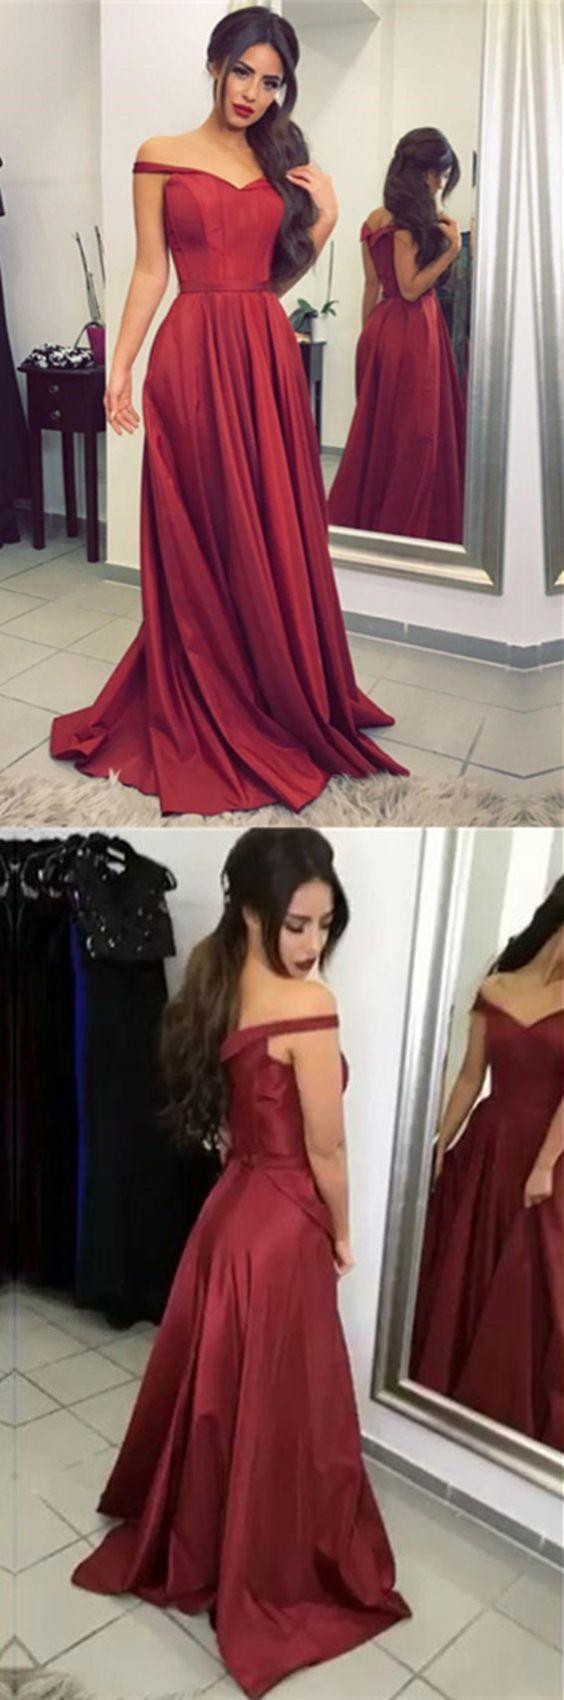 elegant off shoulder prom party dresses , burgundy formal gowns for prom party.